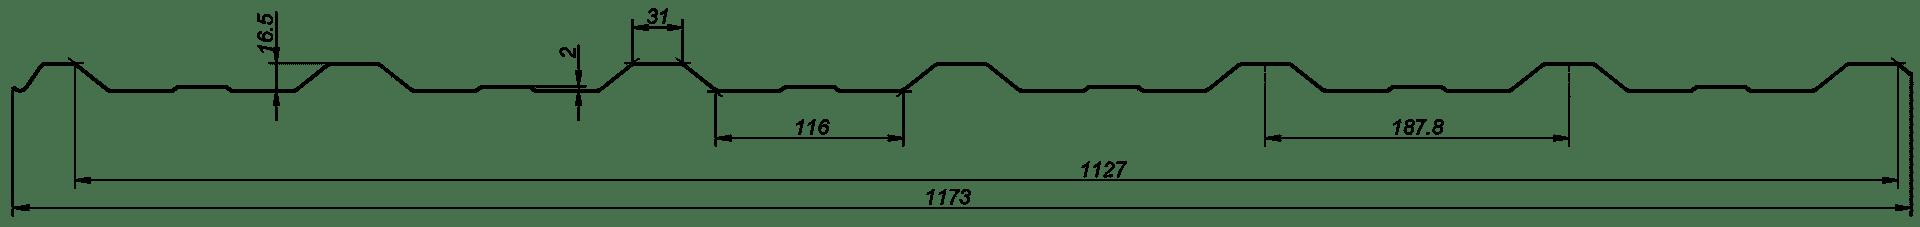 T-18-plus-DACHACHOWA